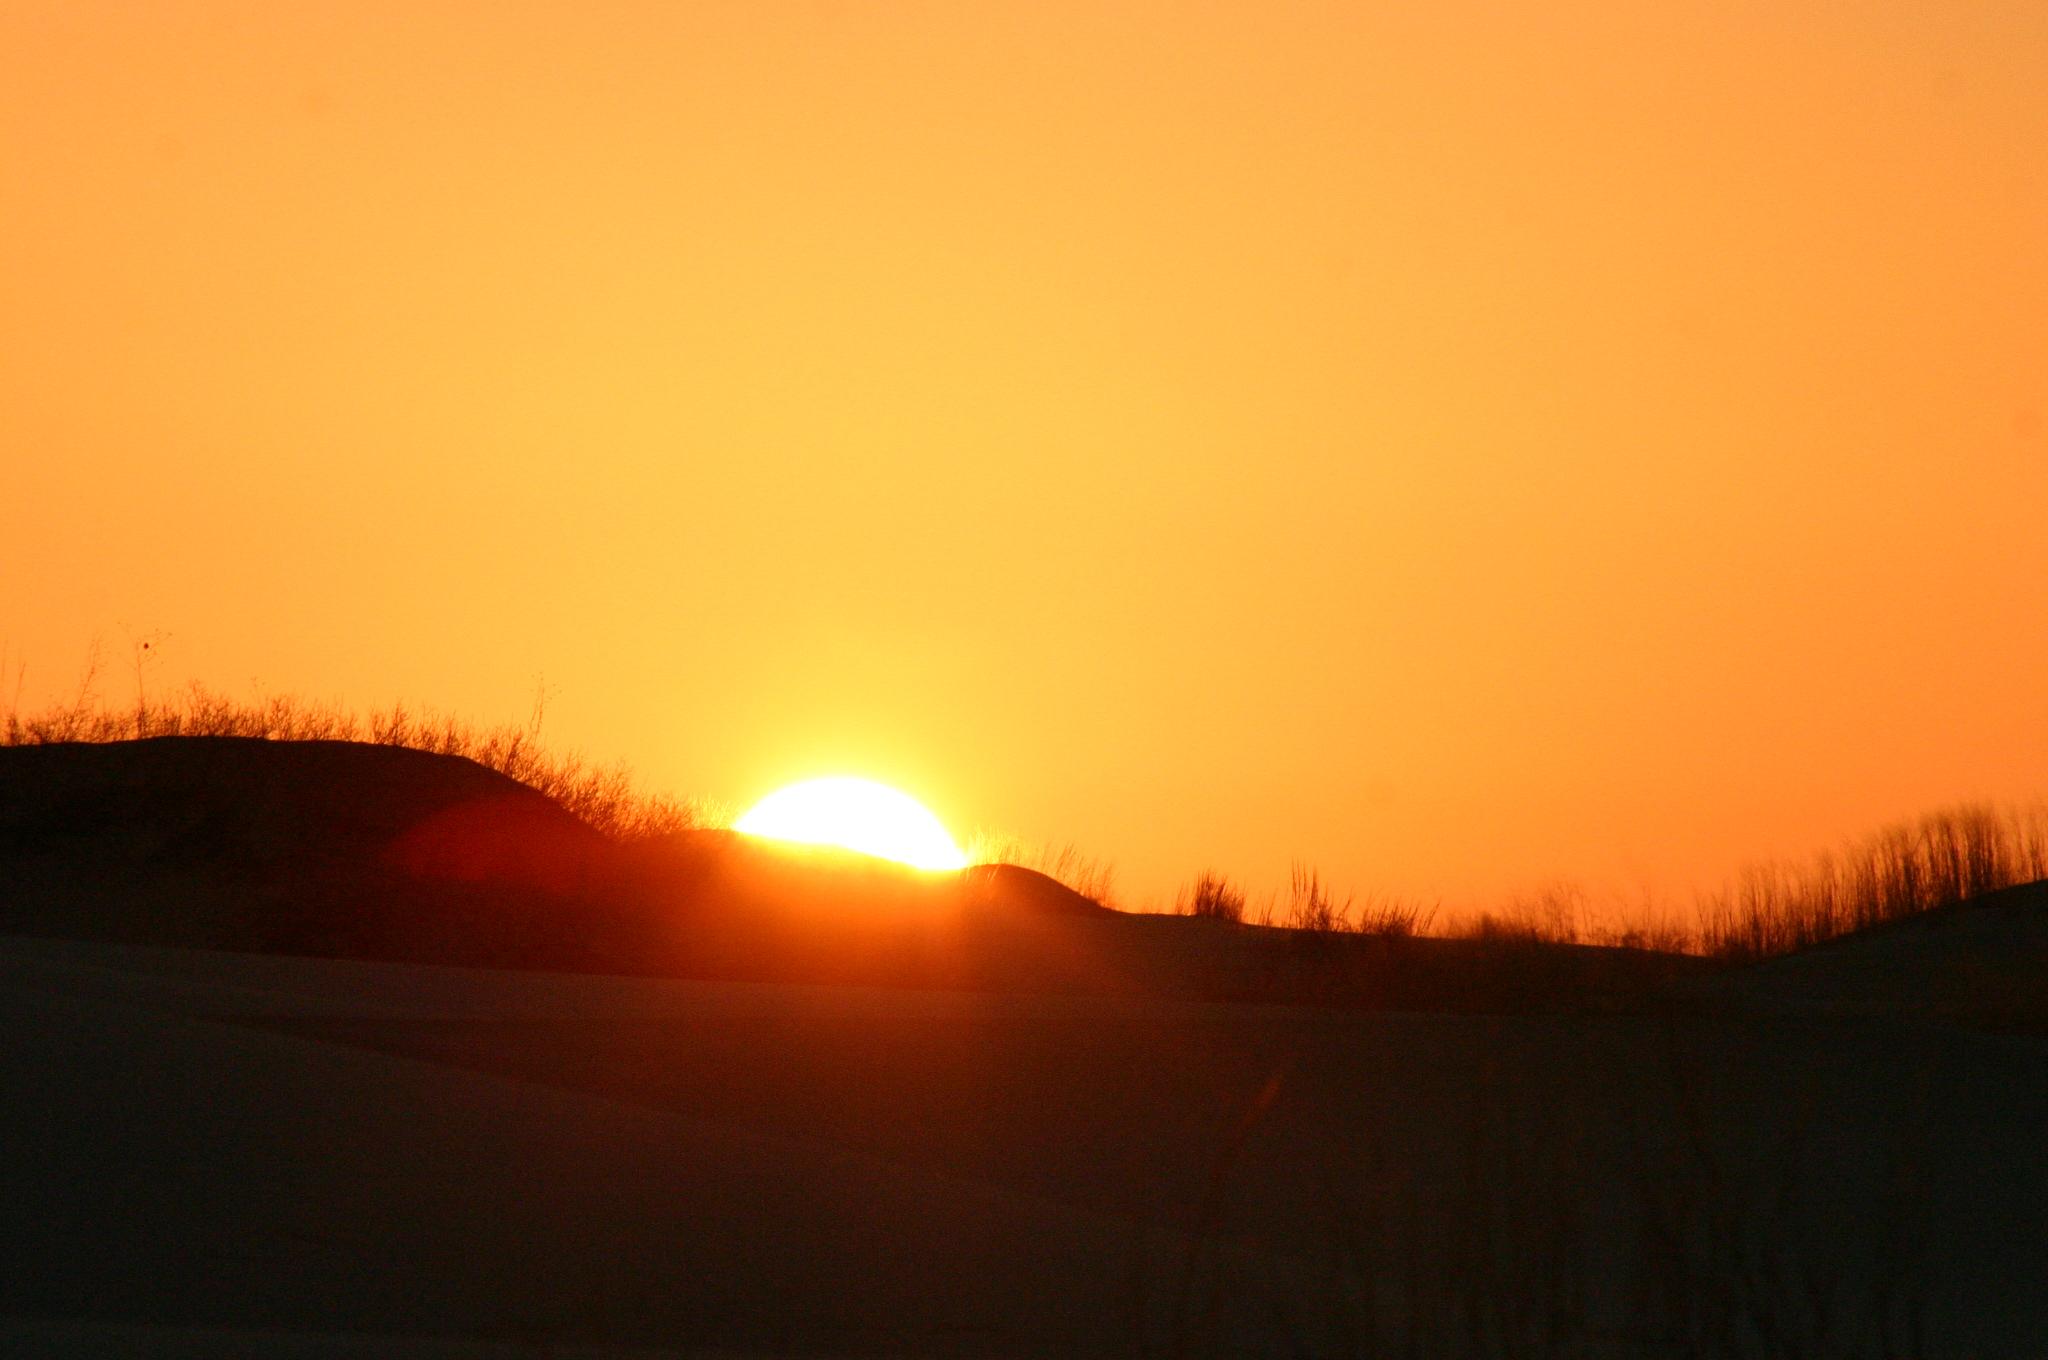 File:Sanddunes Sunrise.jpg - Wikimedia Commons